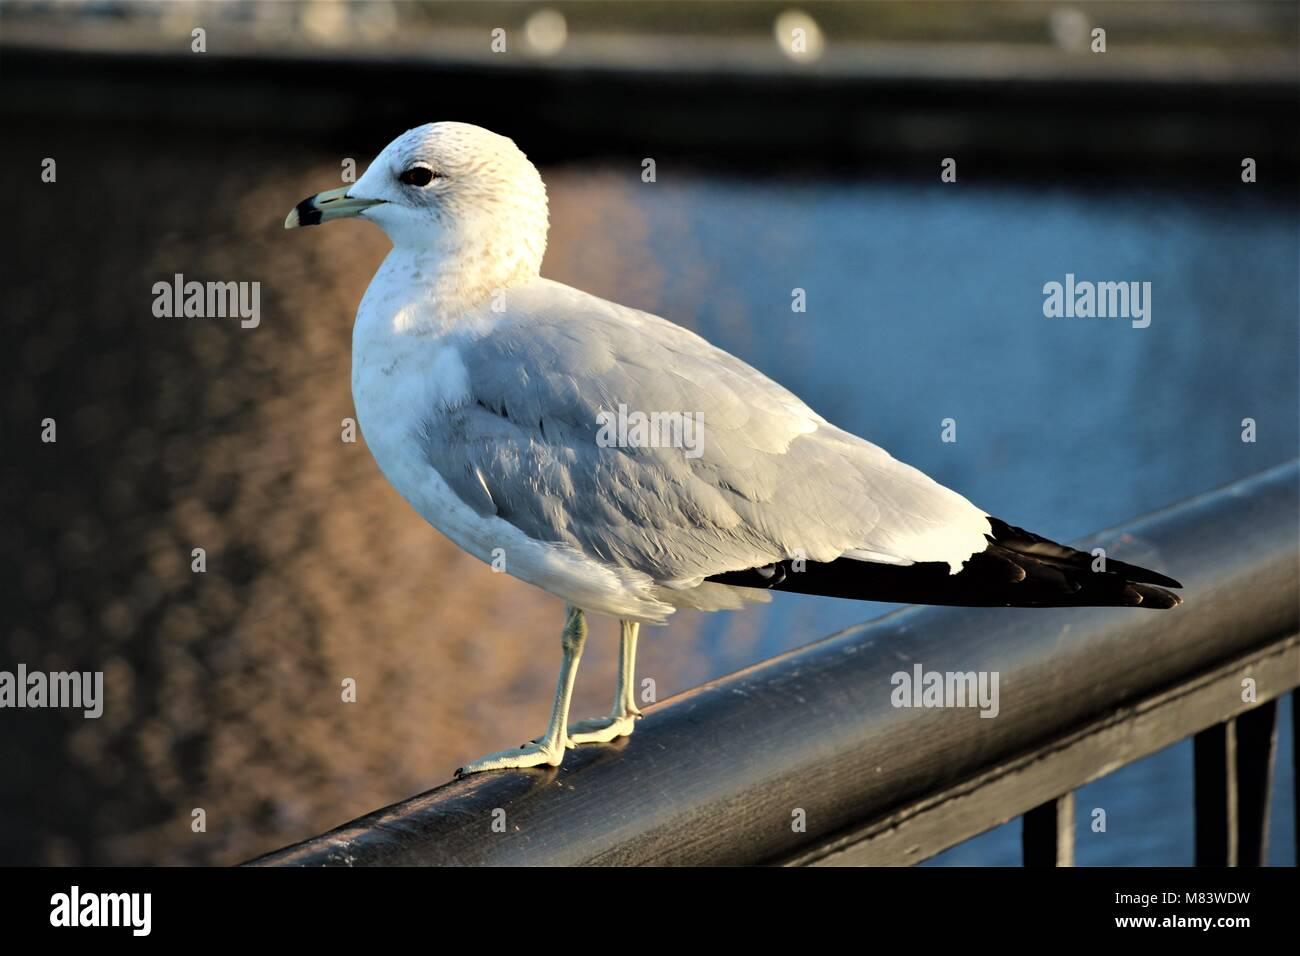 Keeping an eye on things - Stock Image